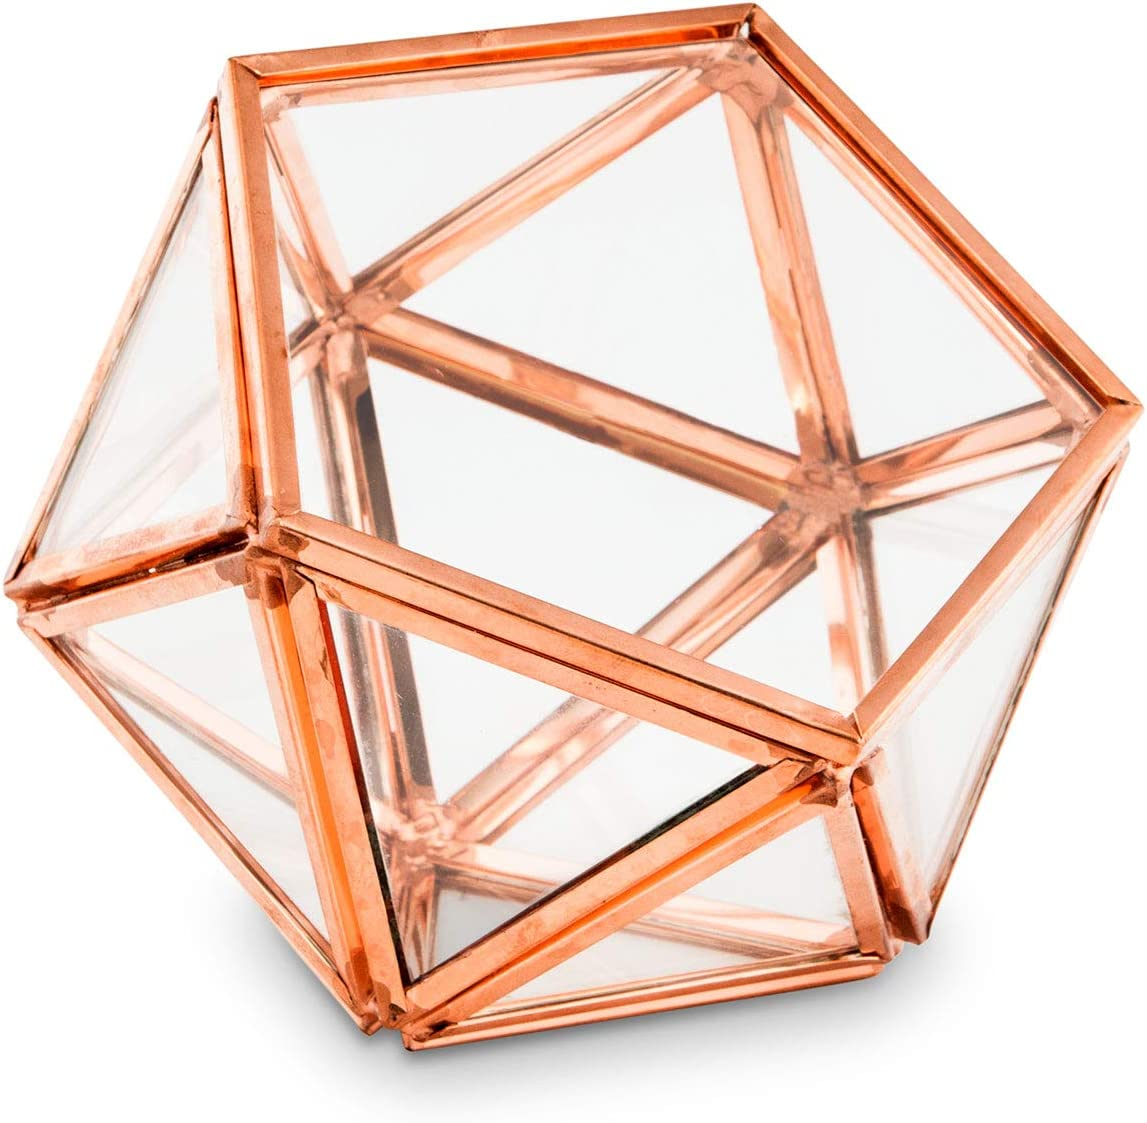 Engagement Ring Box Proposal Ring Box Mini Terrarium Copper Wedding Decor Geometric Glass Wedding Ring Bearer Box Diamond Ring Box